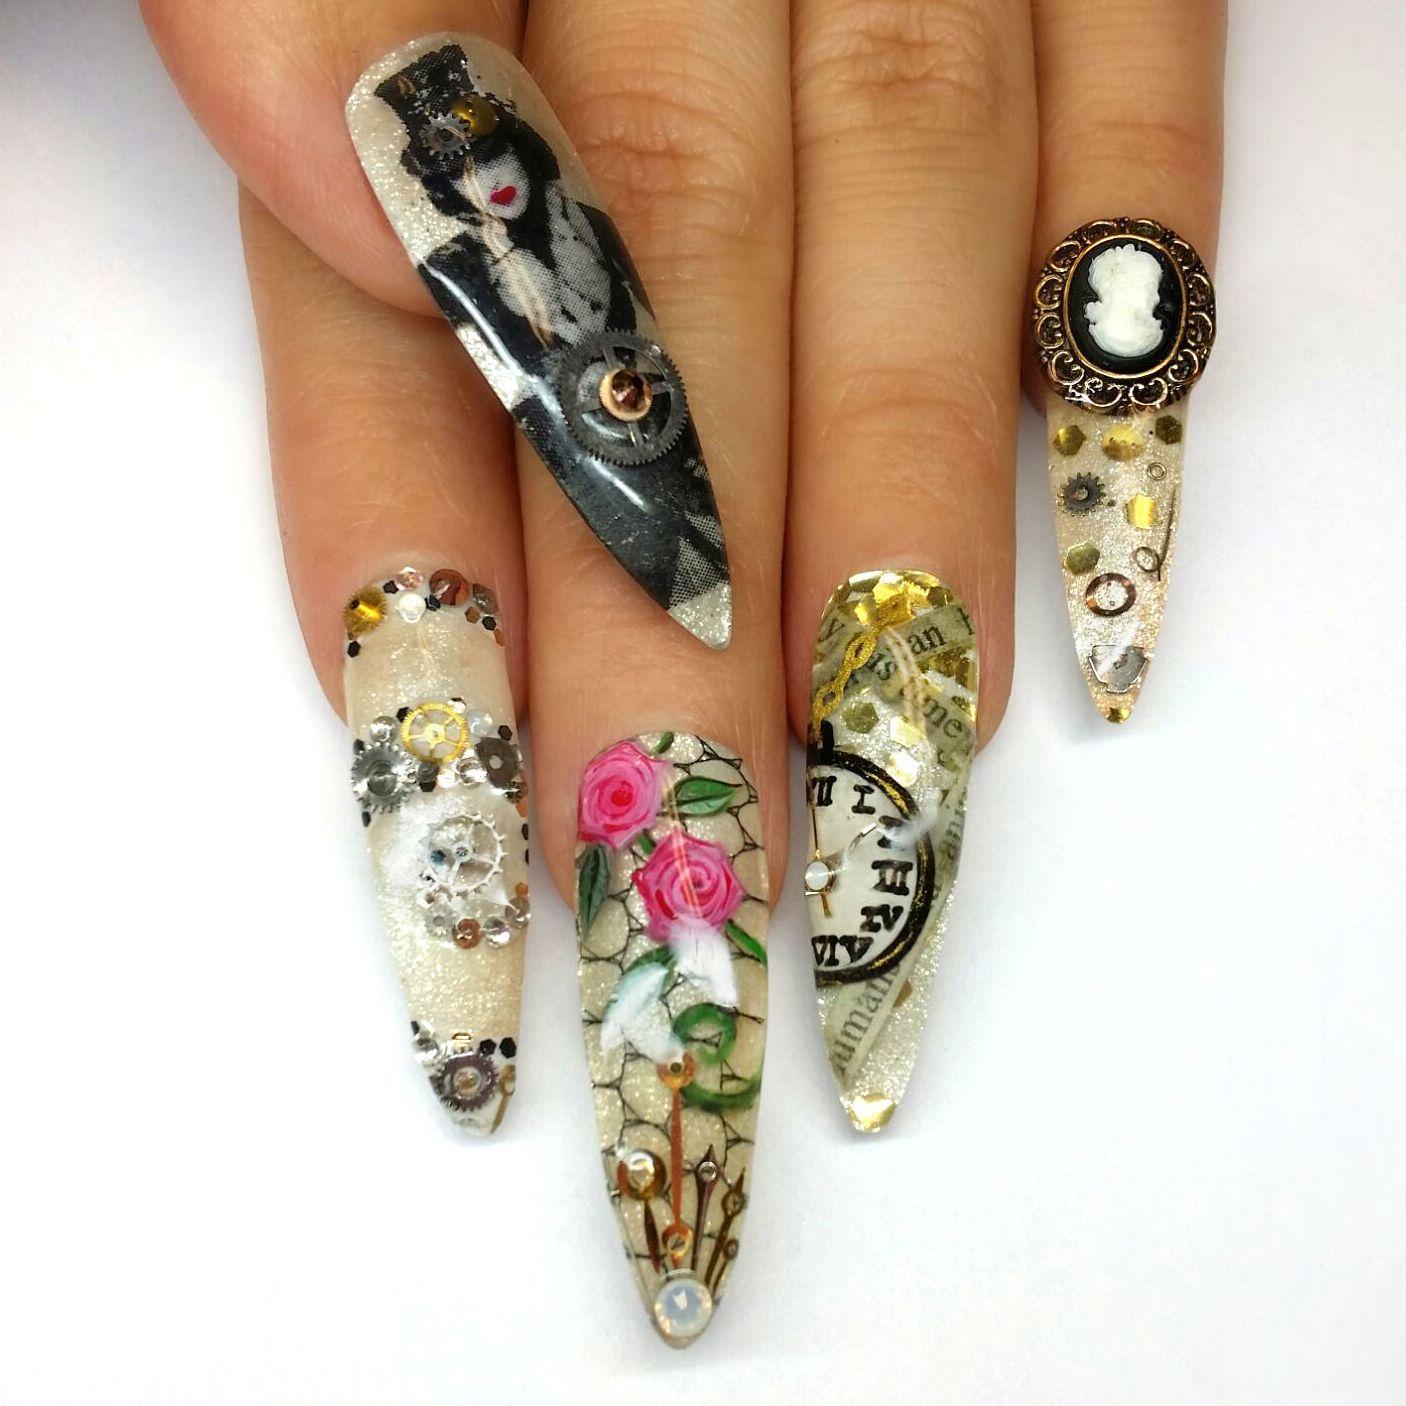 Danielle | Top nail, Nails magazine and Magazines